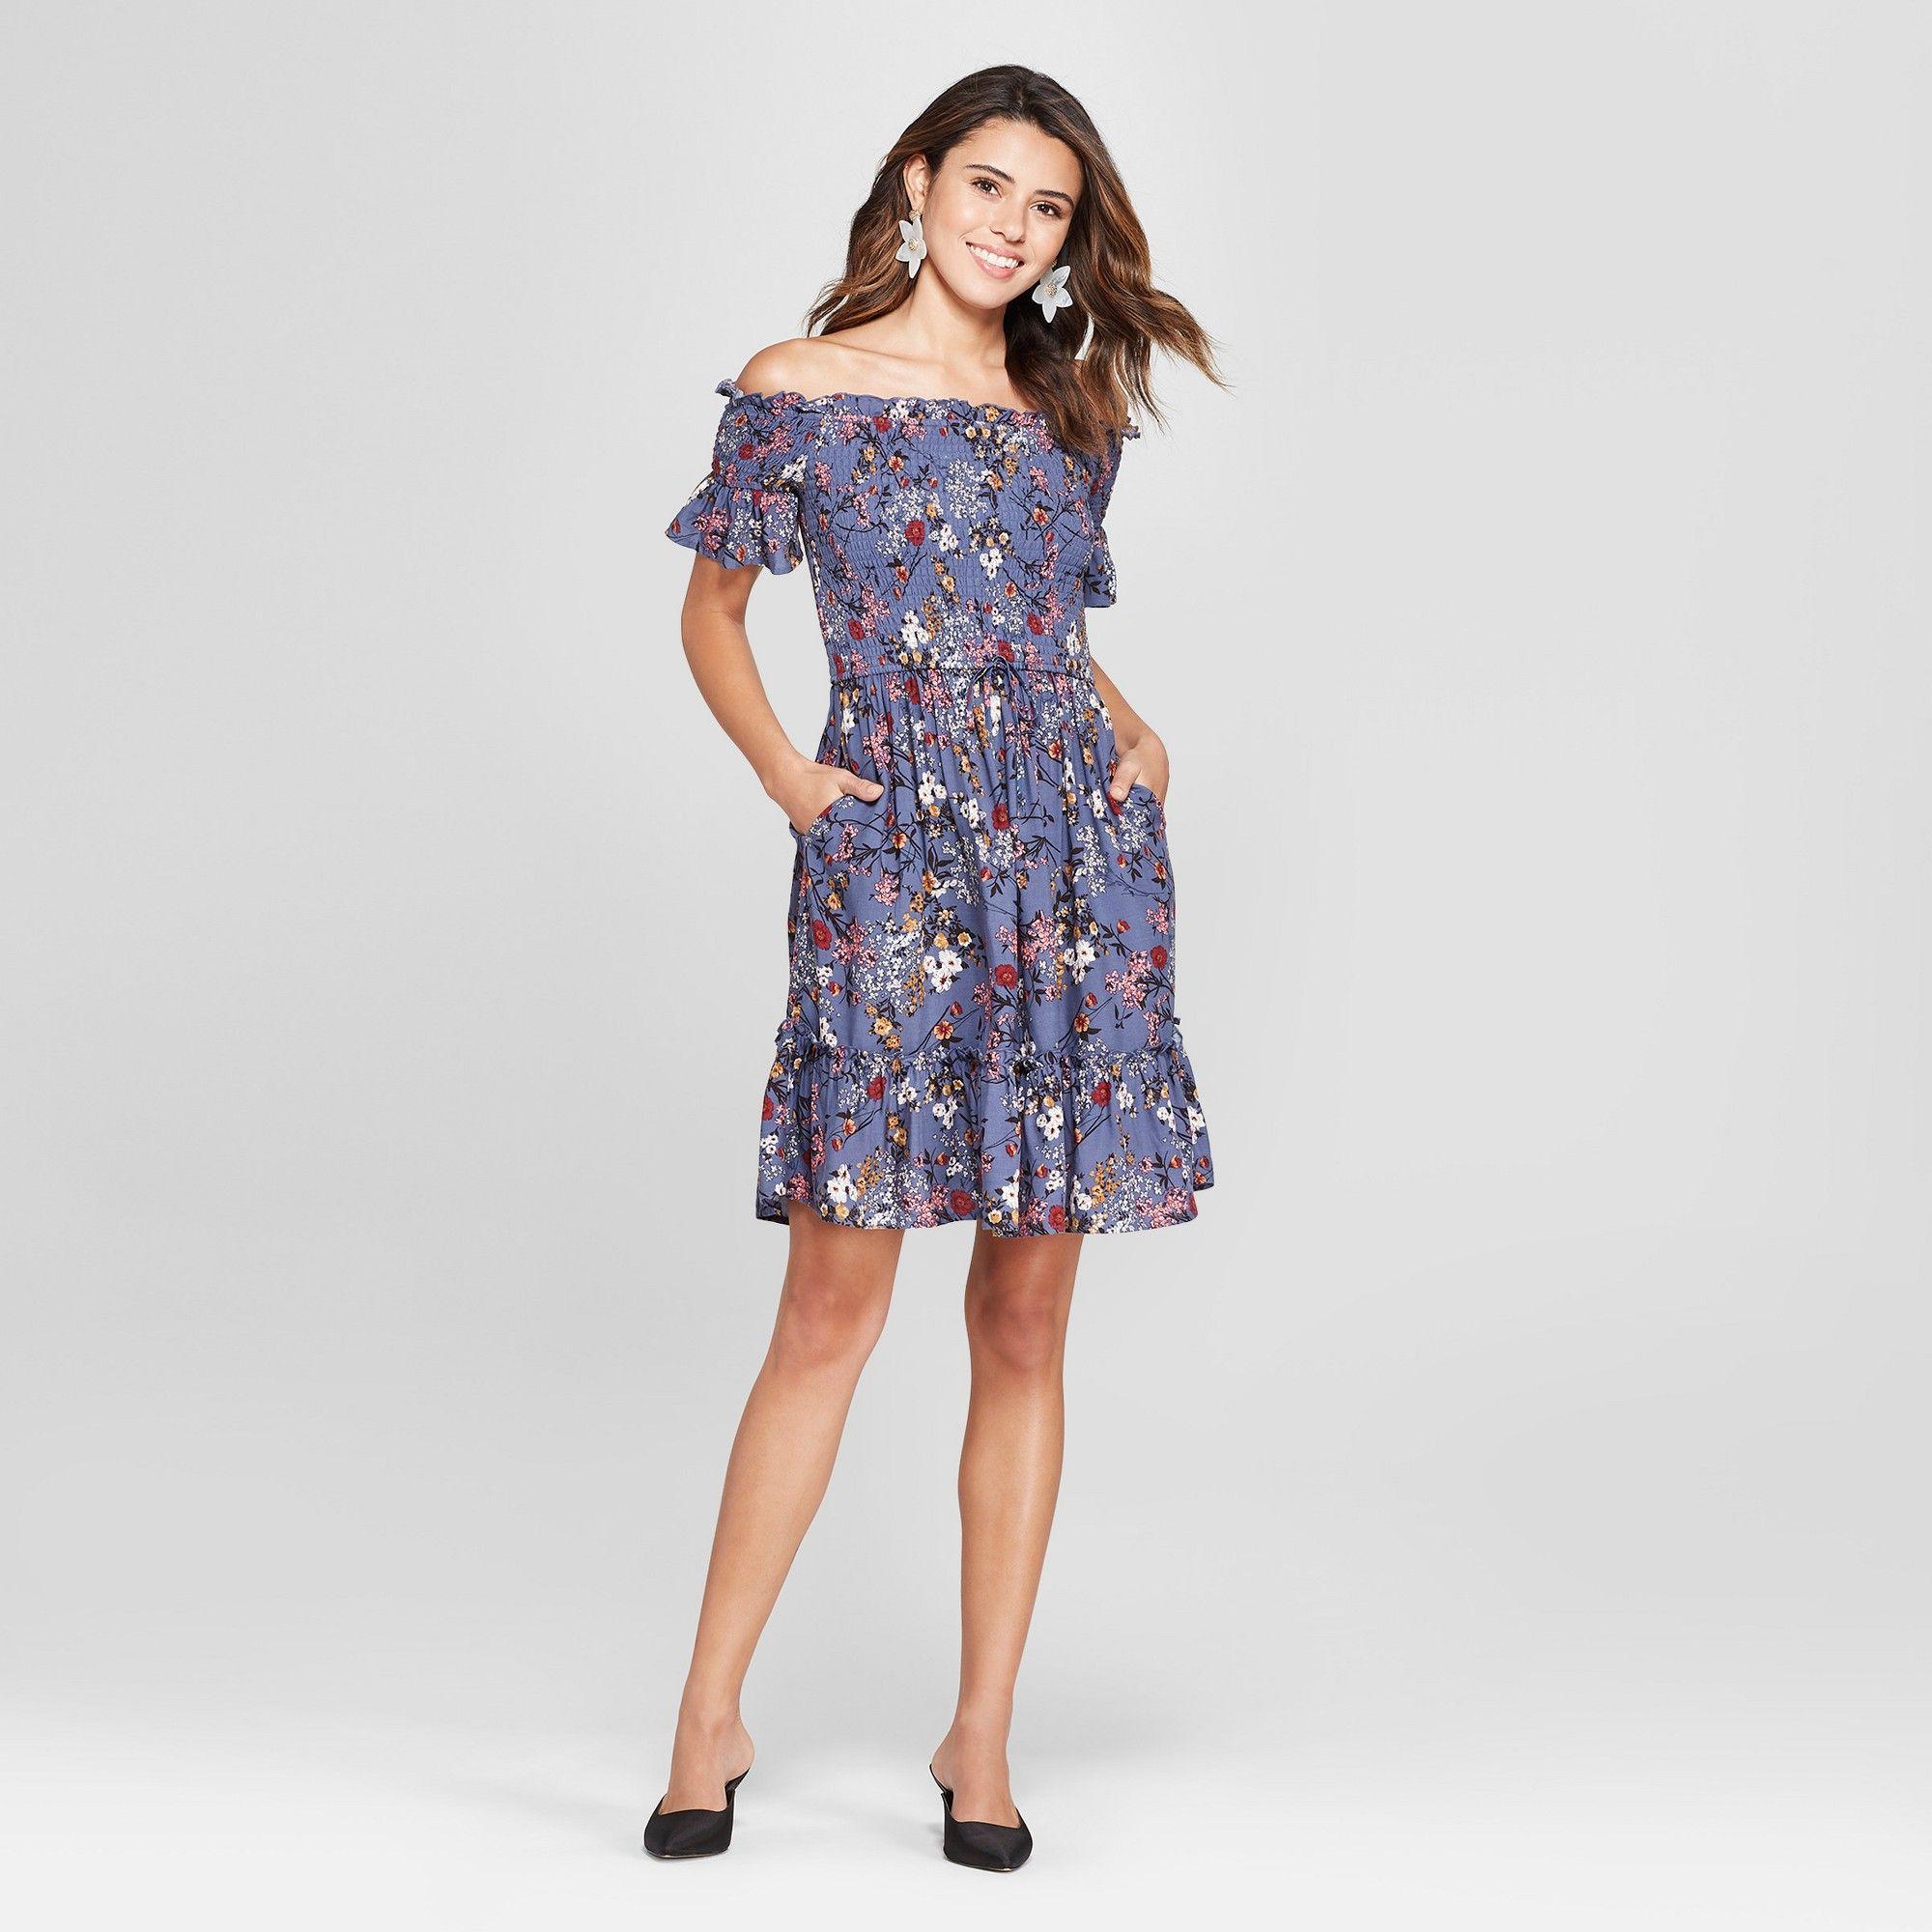 21e0380554 Women s Floral Print Short Sleeve Off the Shoulder Dress - Xhilaration Blue  Xxl